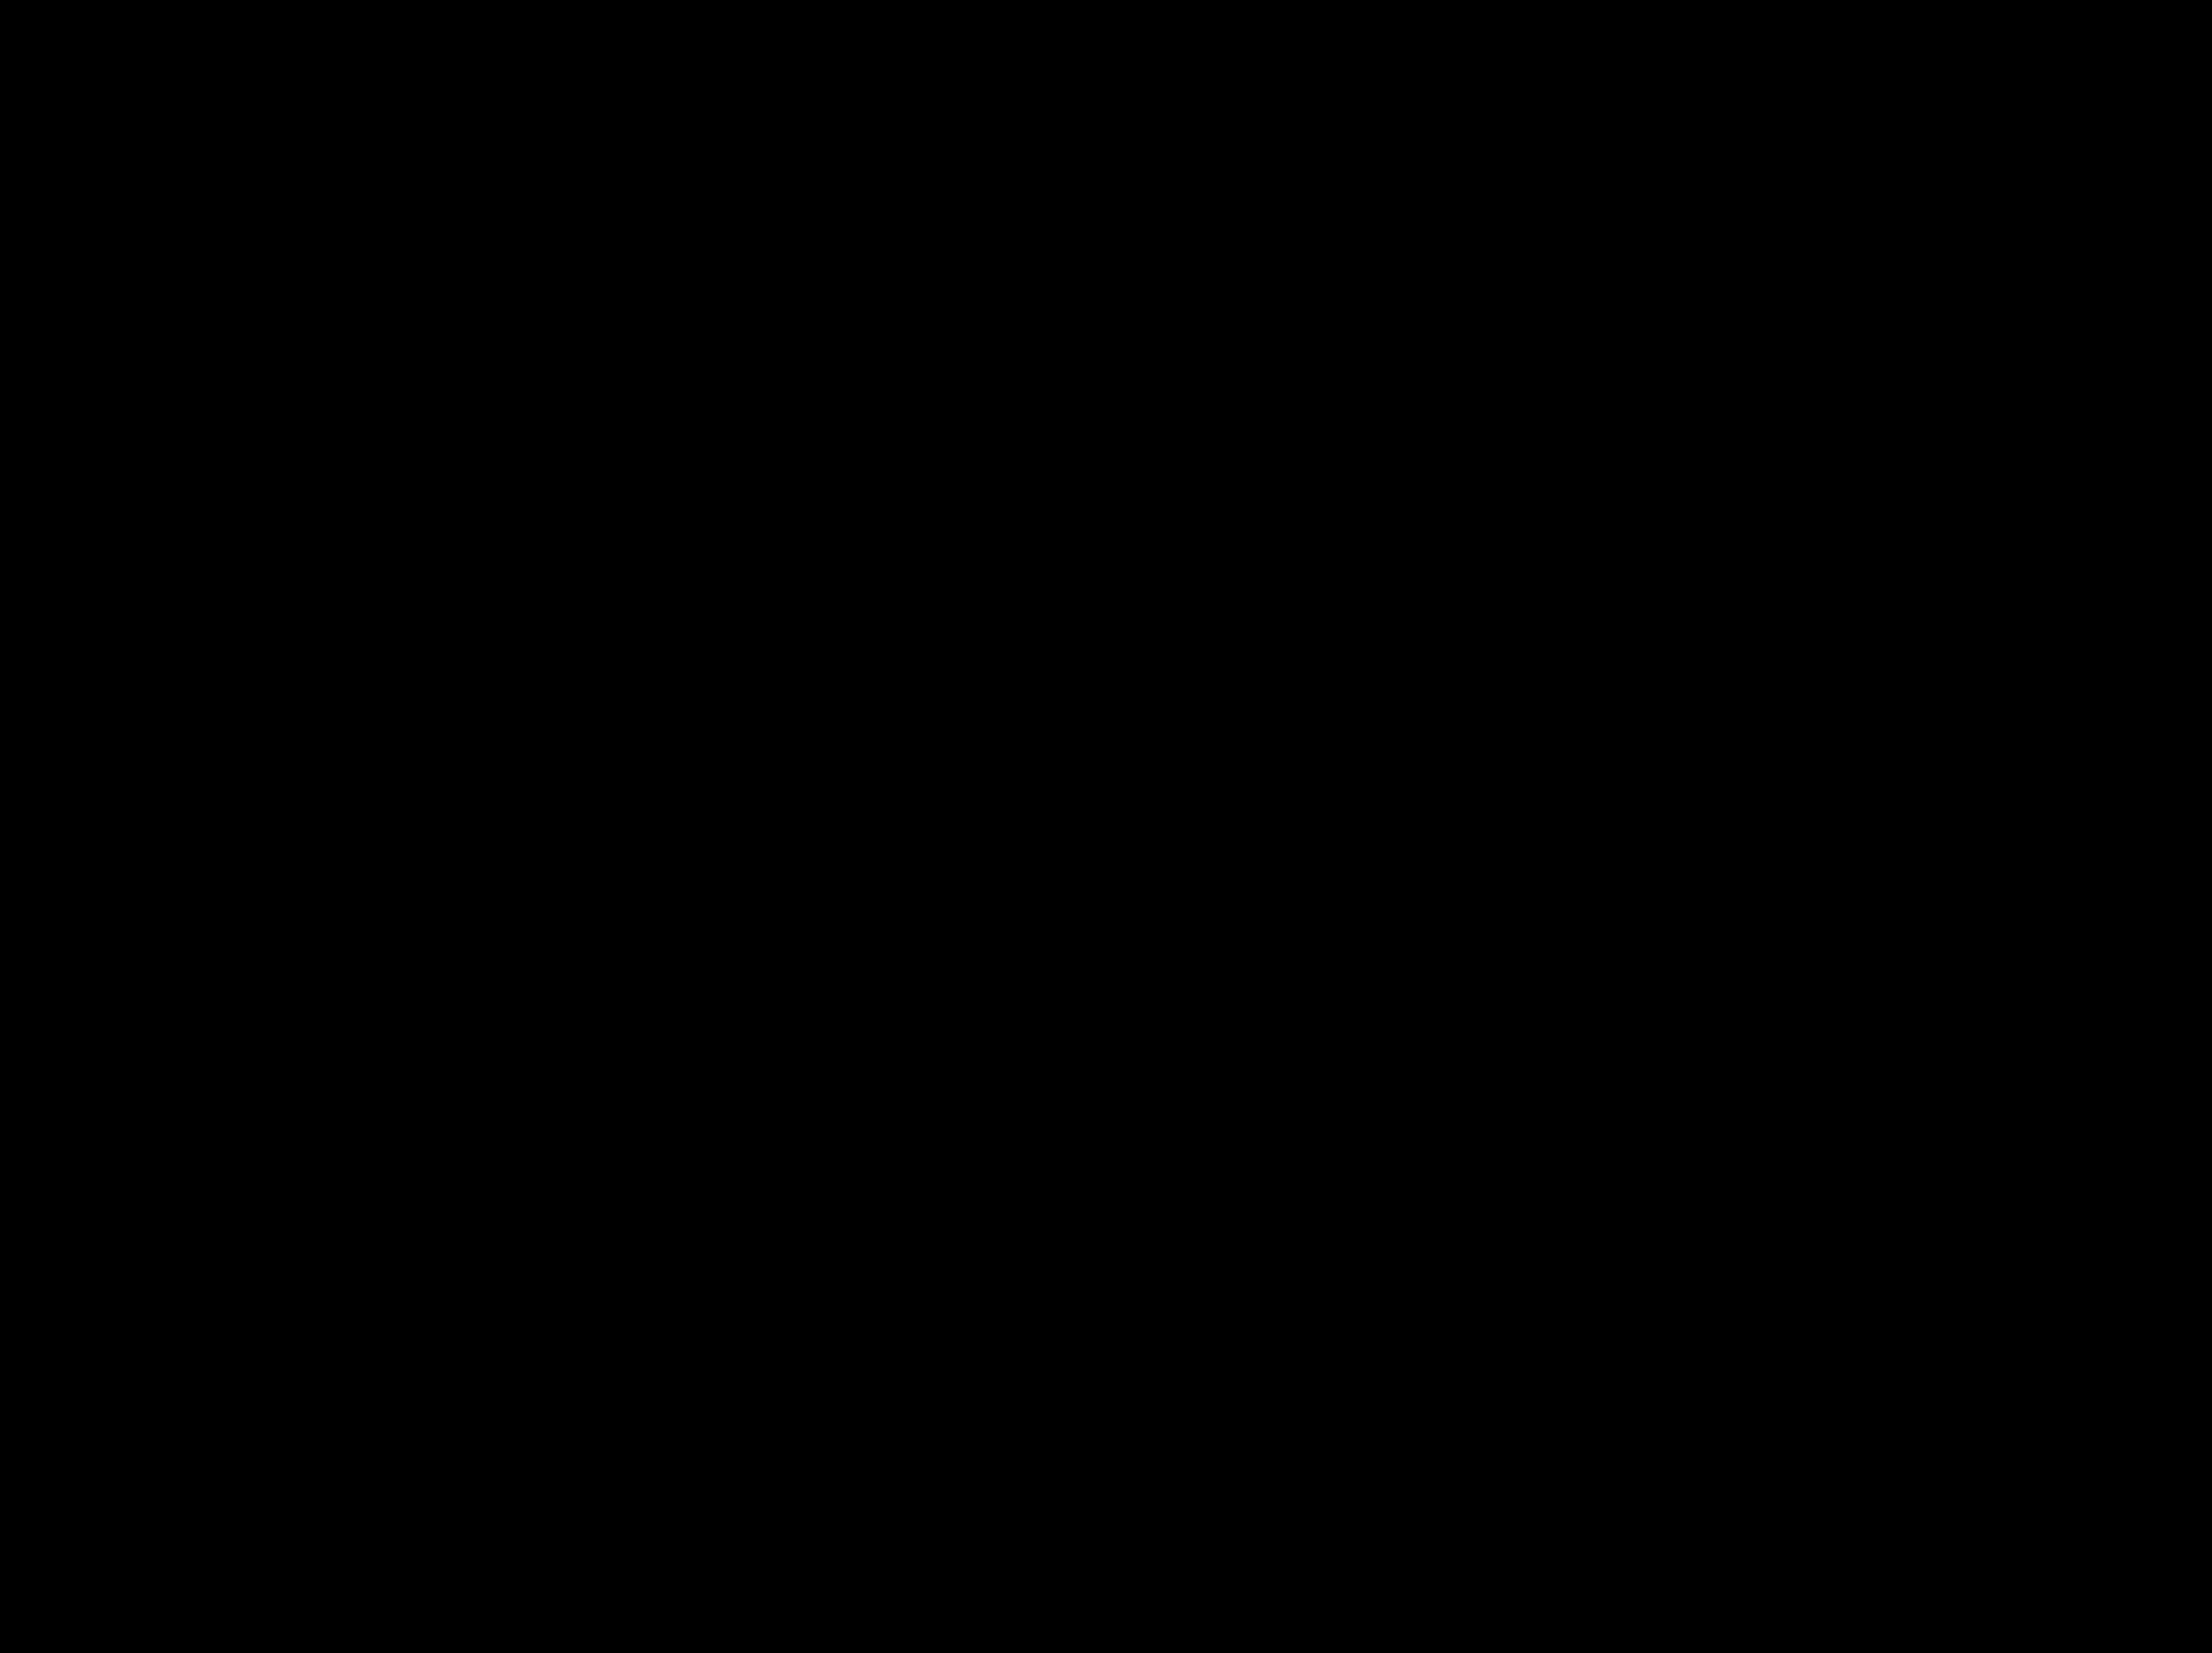 2318x1732 Clipart